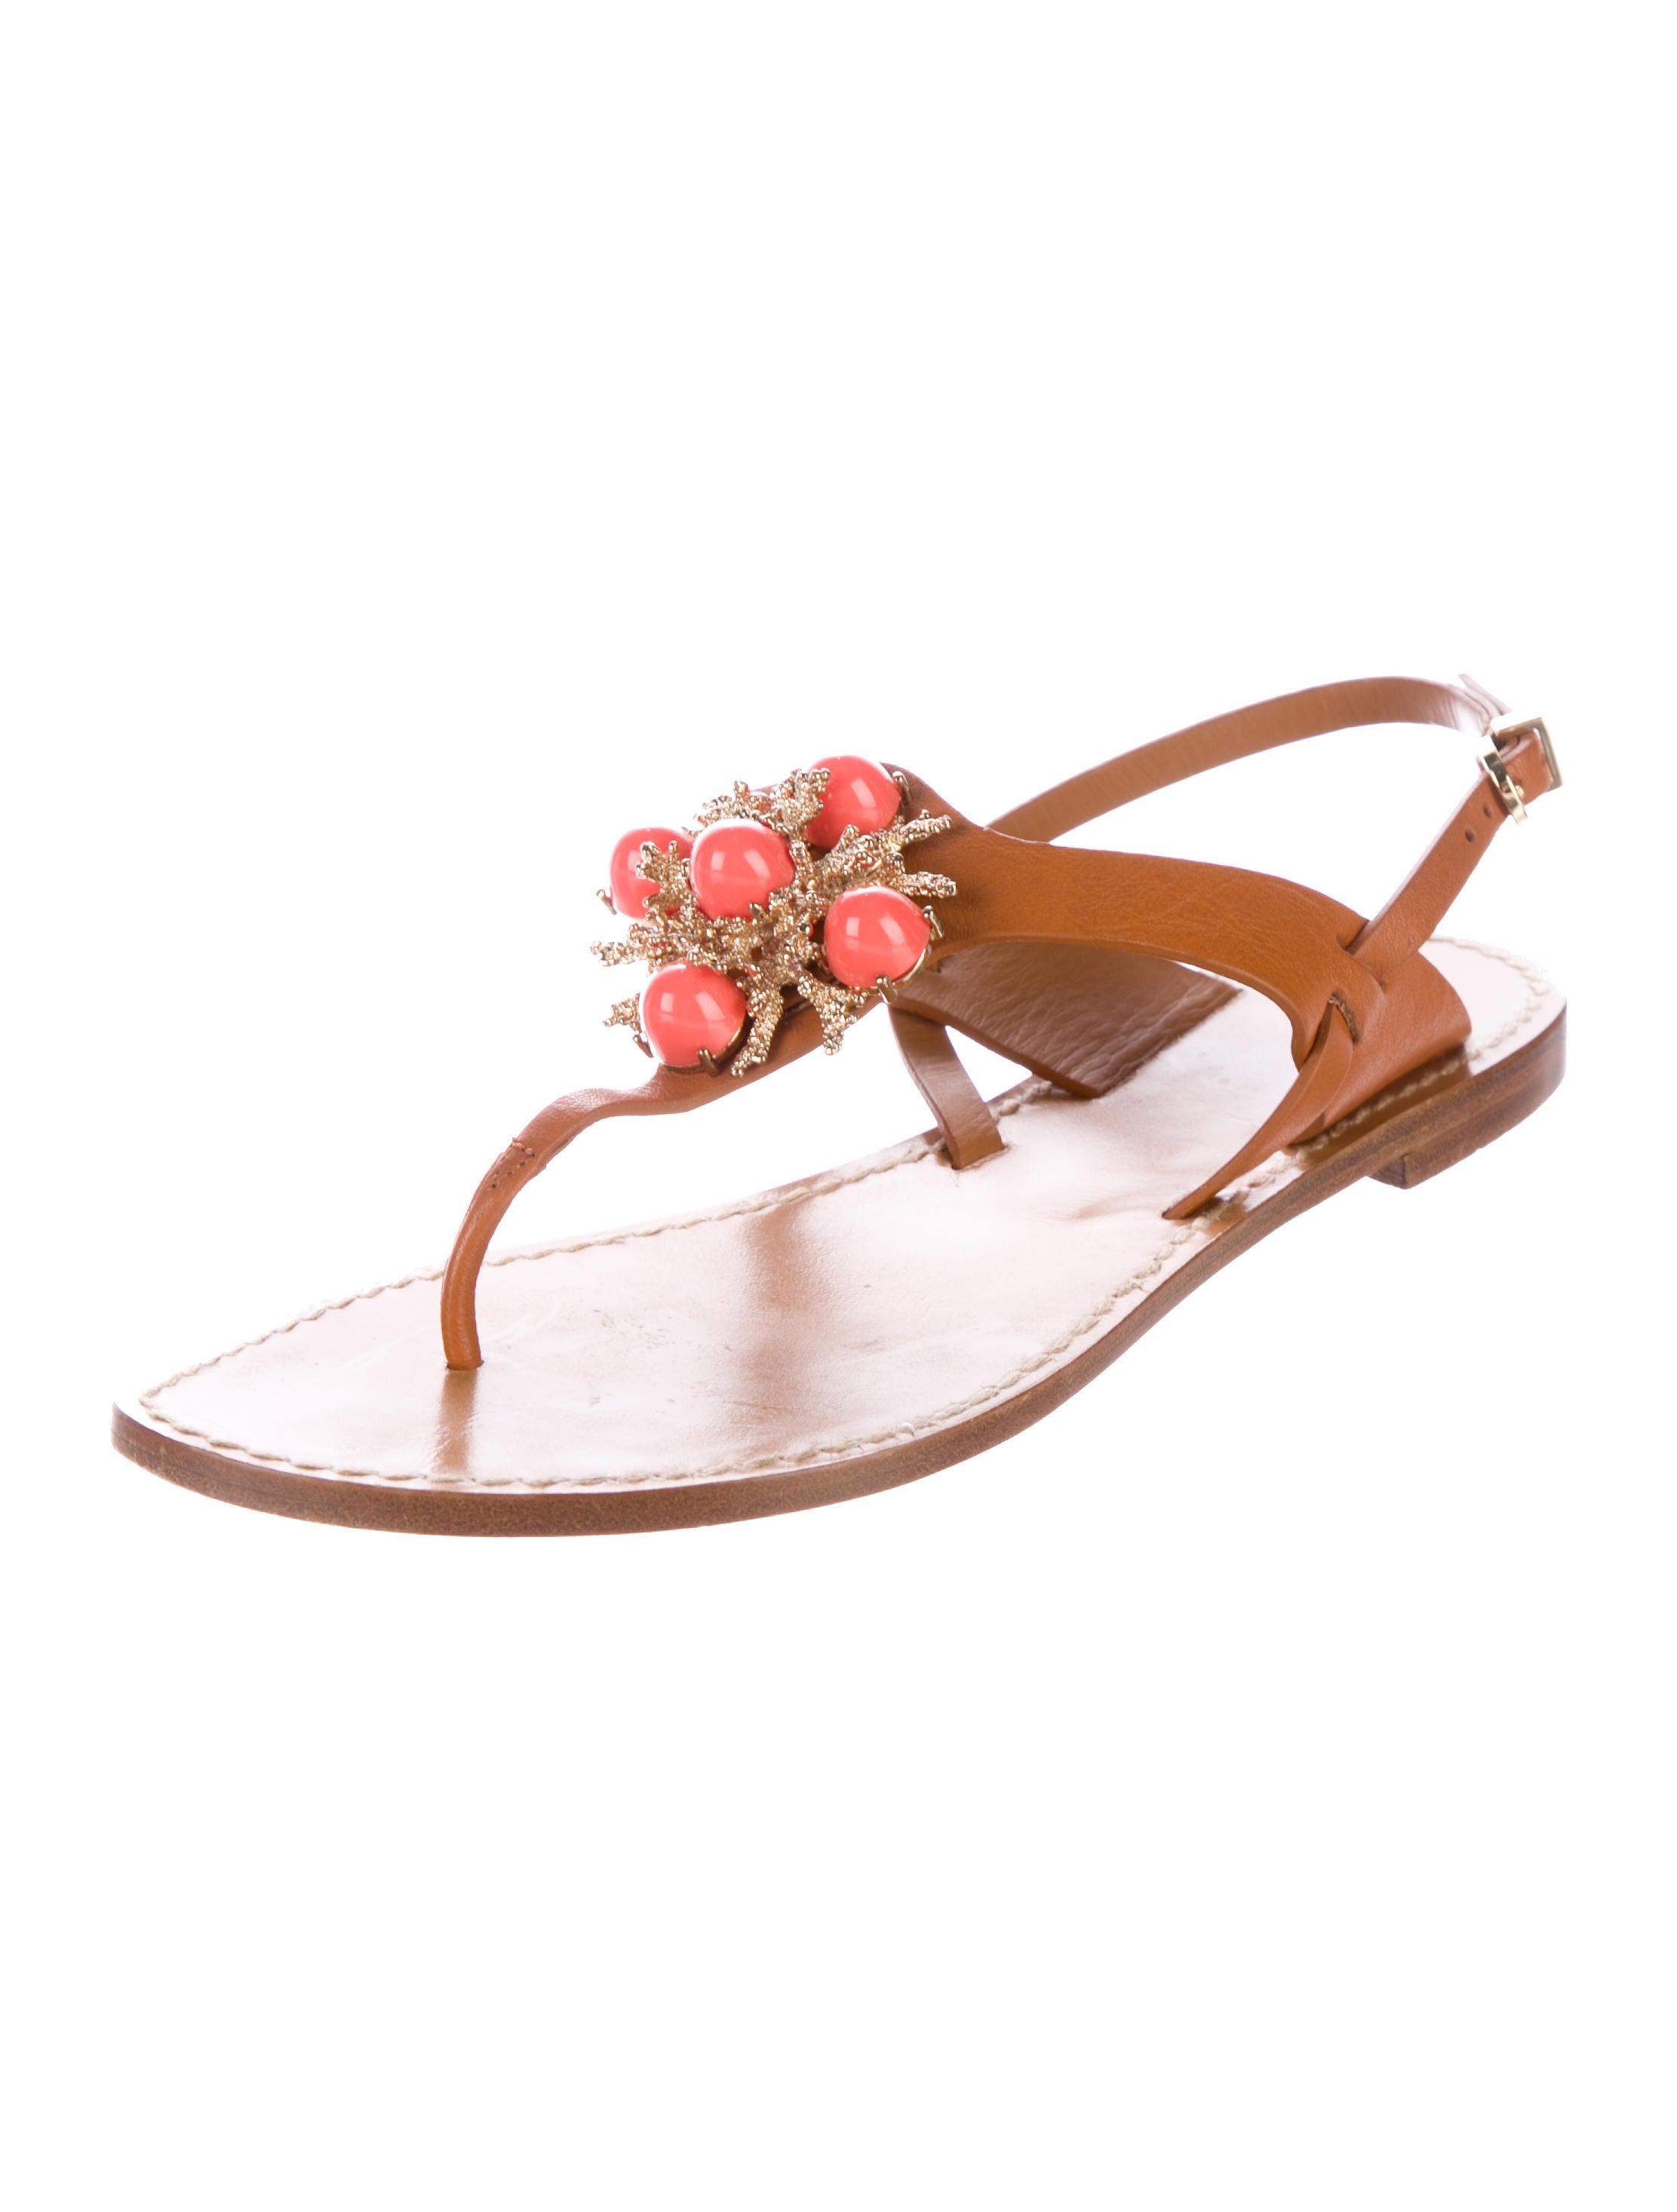 AERIN Embellished Leather Sandals - Shoes